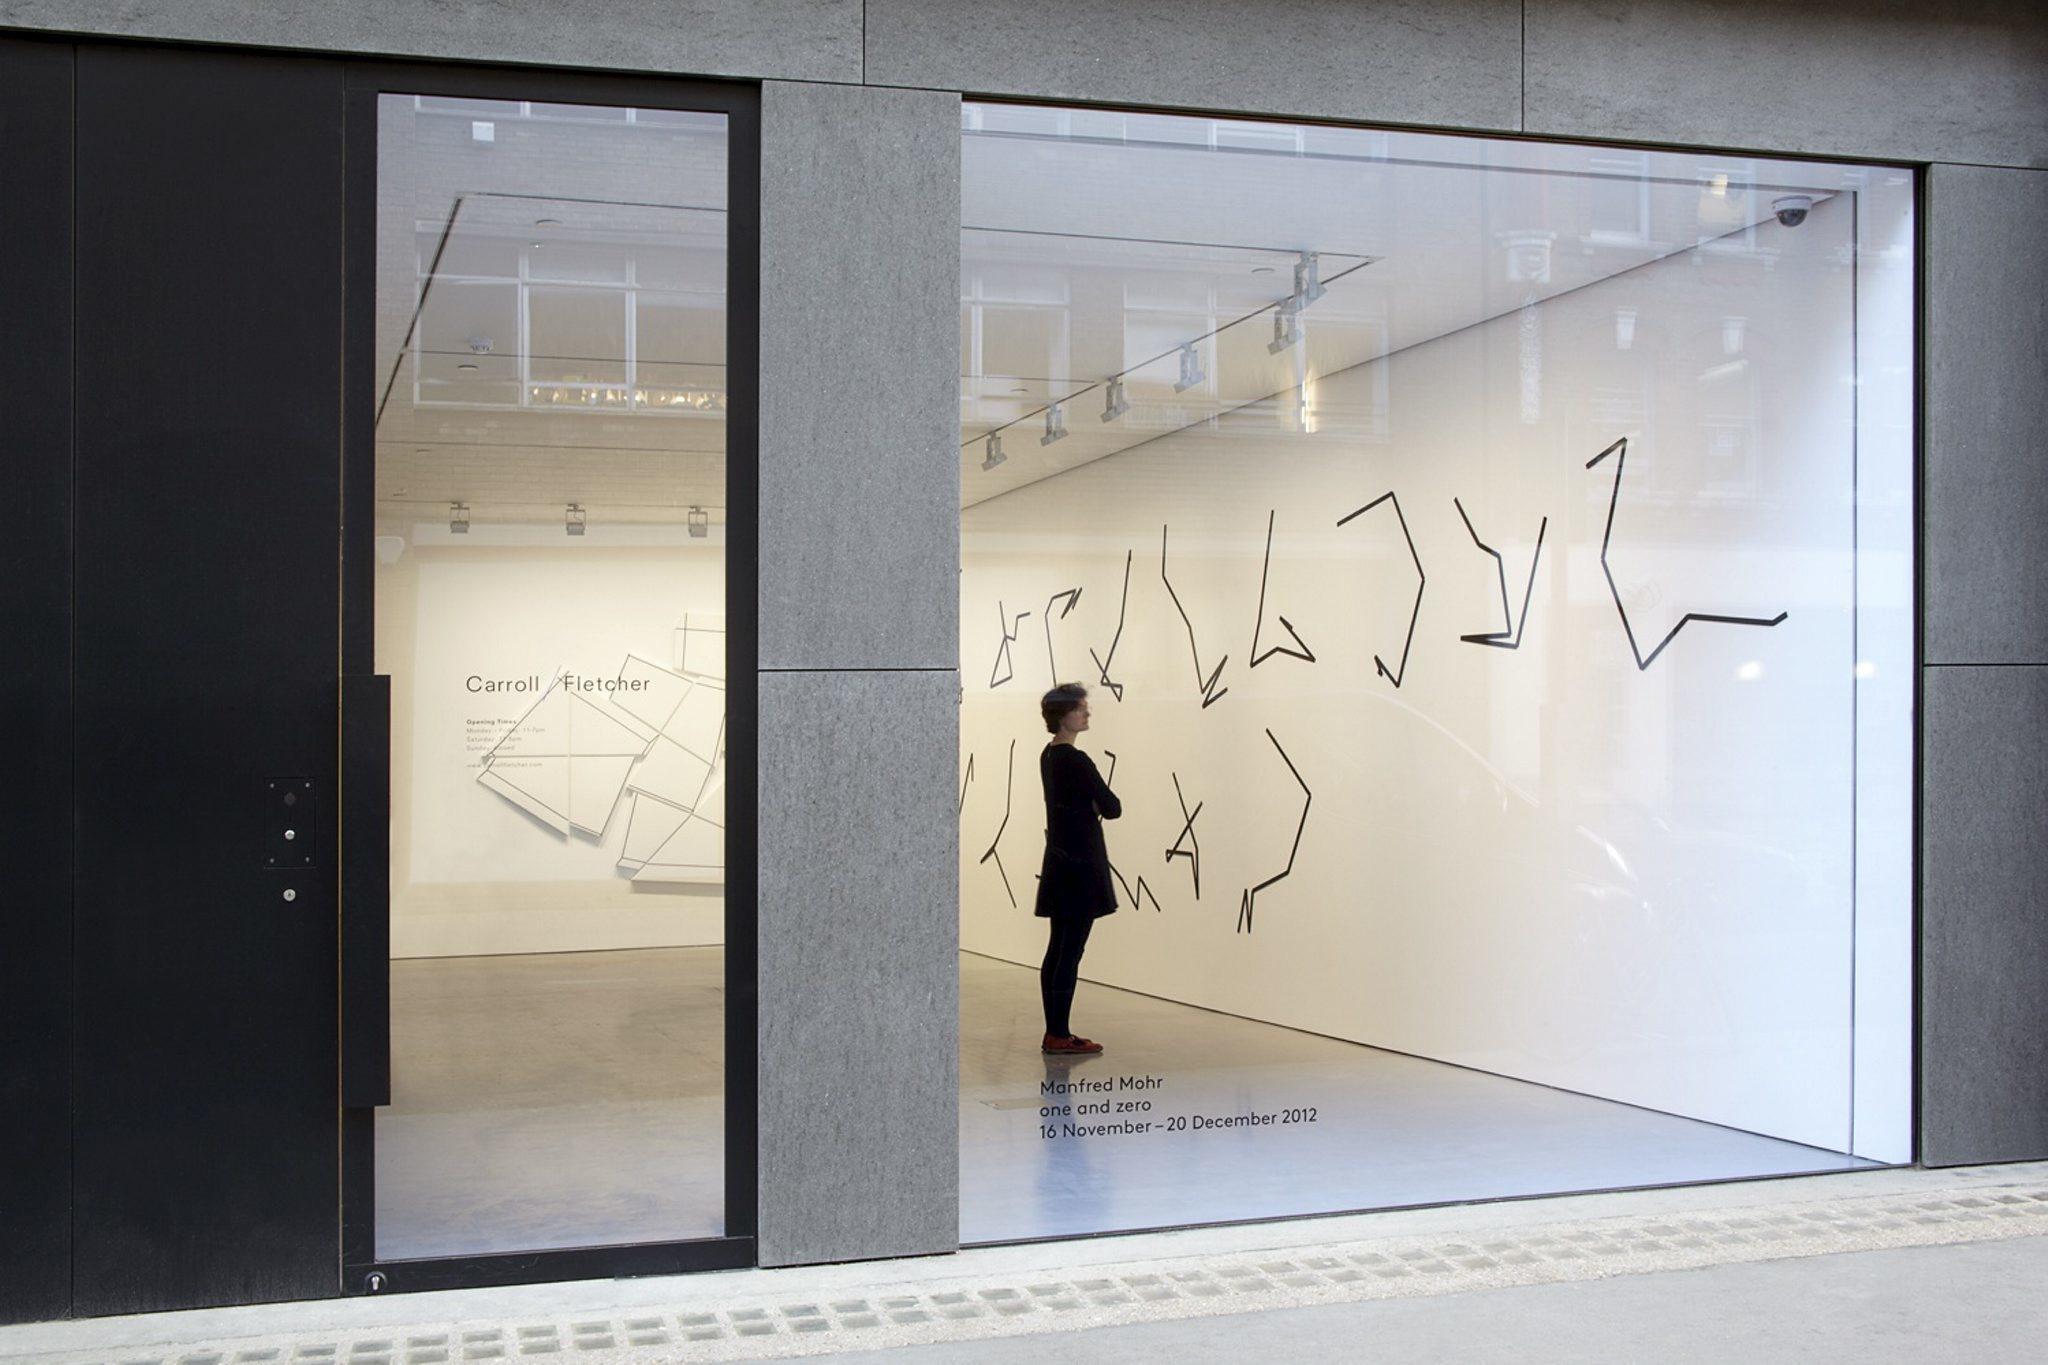 Visit Caroll/Fletcher Gallery